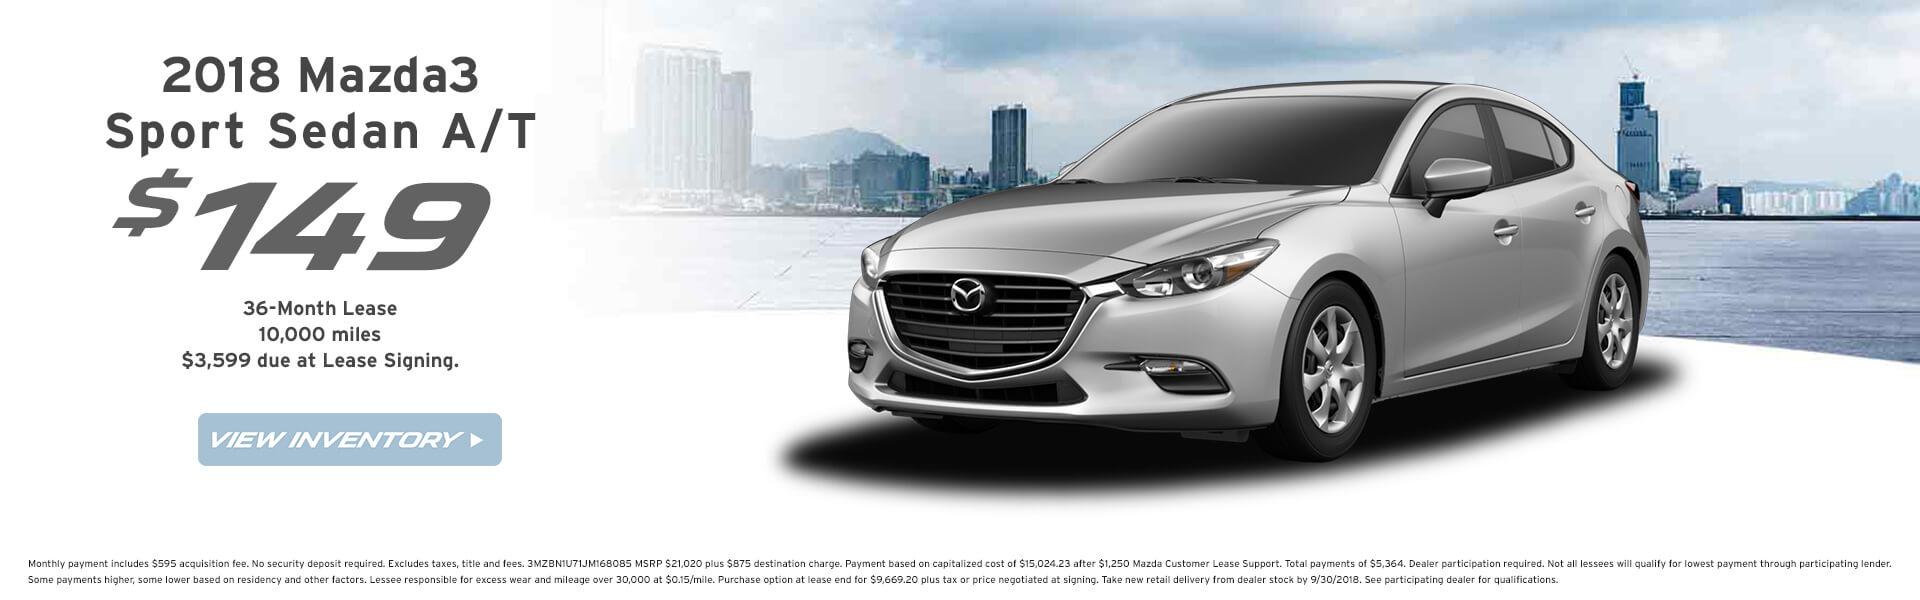 Mazda3 Lease $149